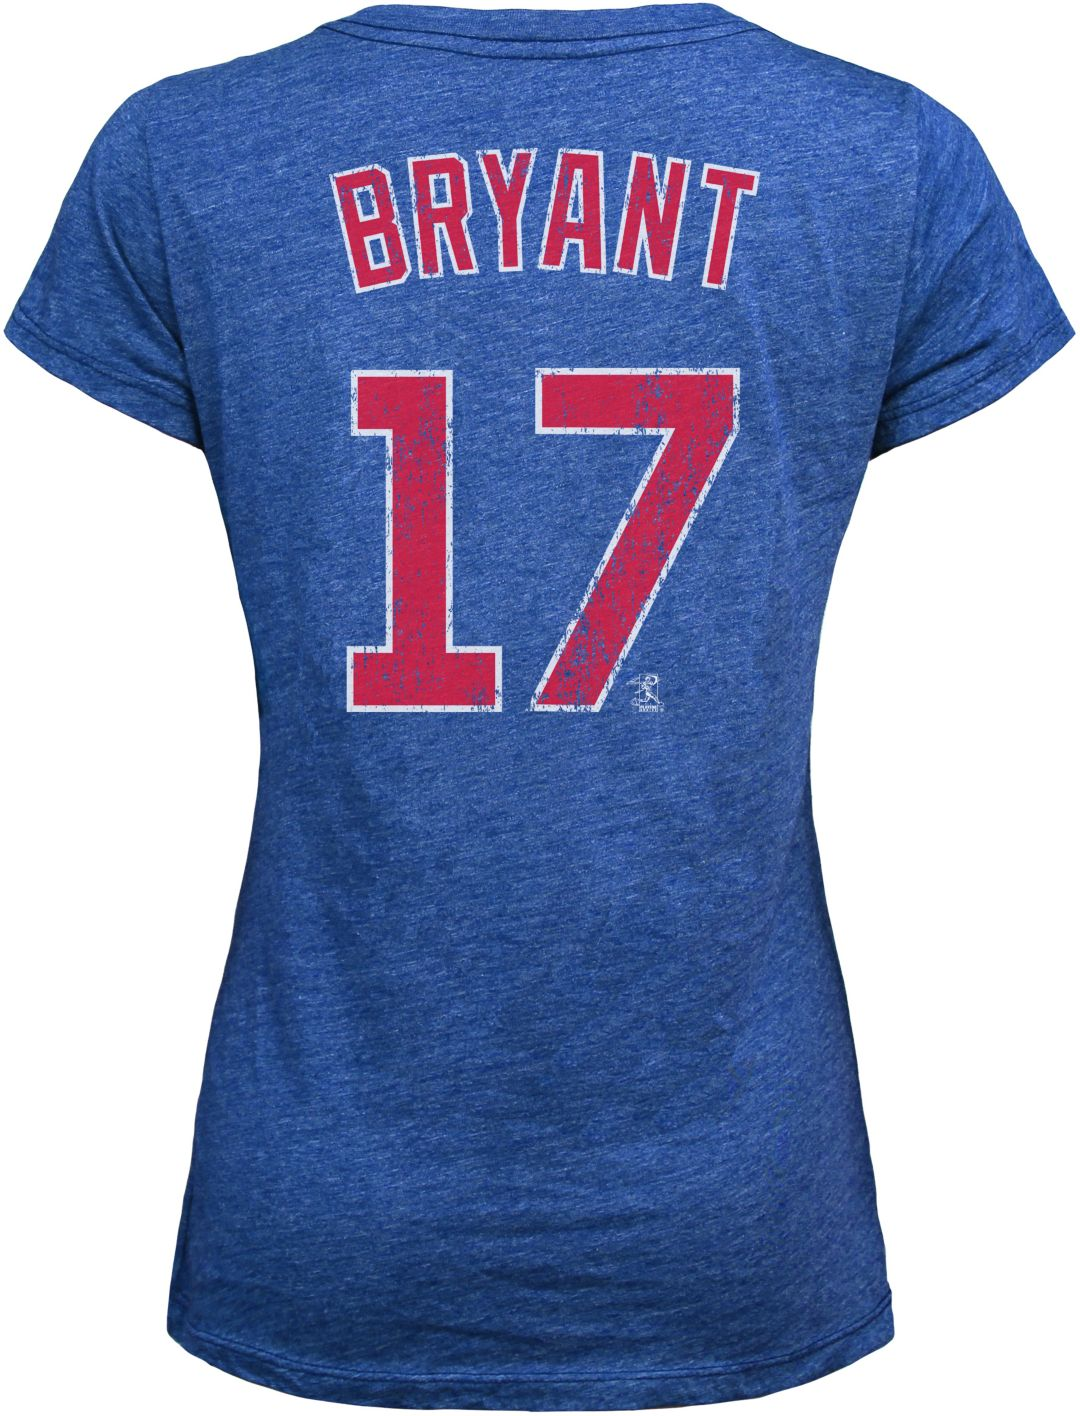 quality design 1d256 5fb20 Majestic Threads Women's Chicago Cubs Kris Bryant Royal V-Neck T-Shirt